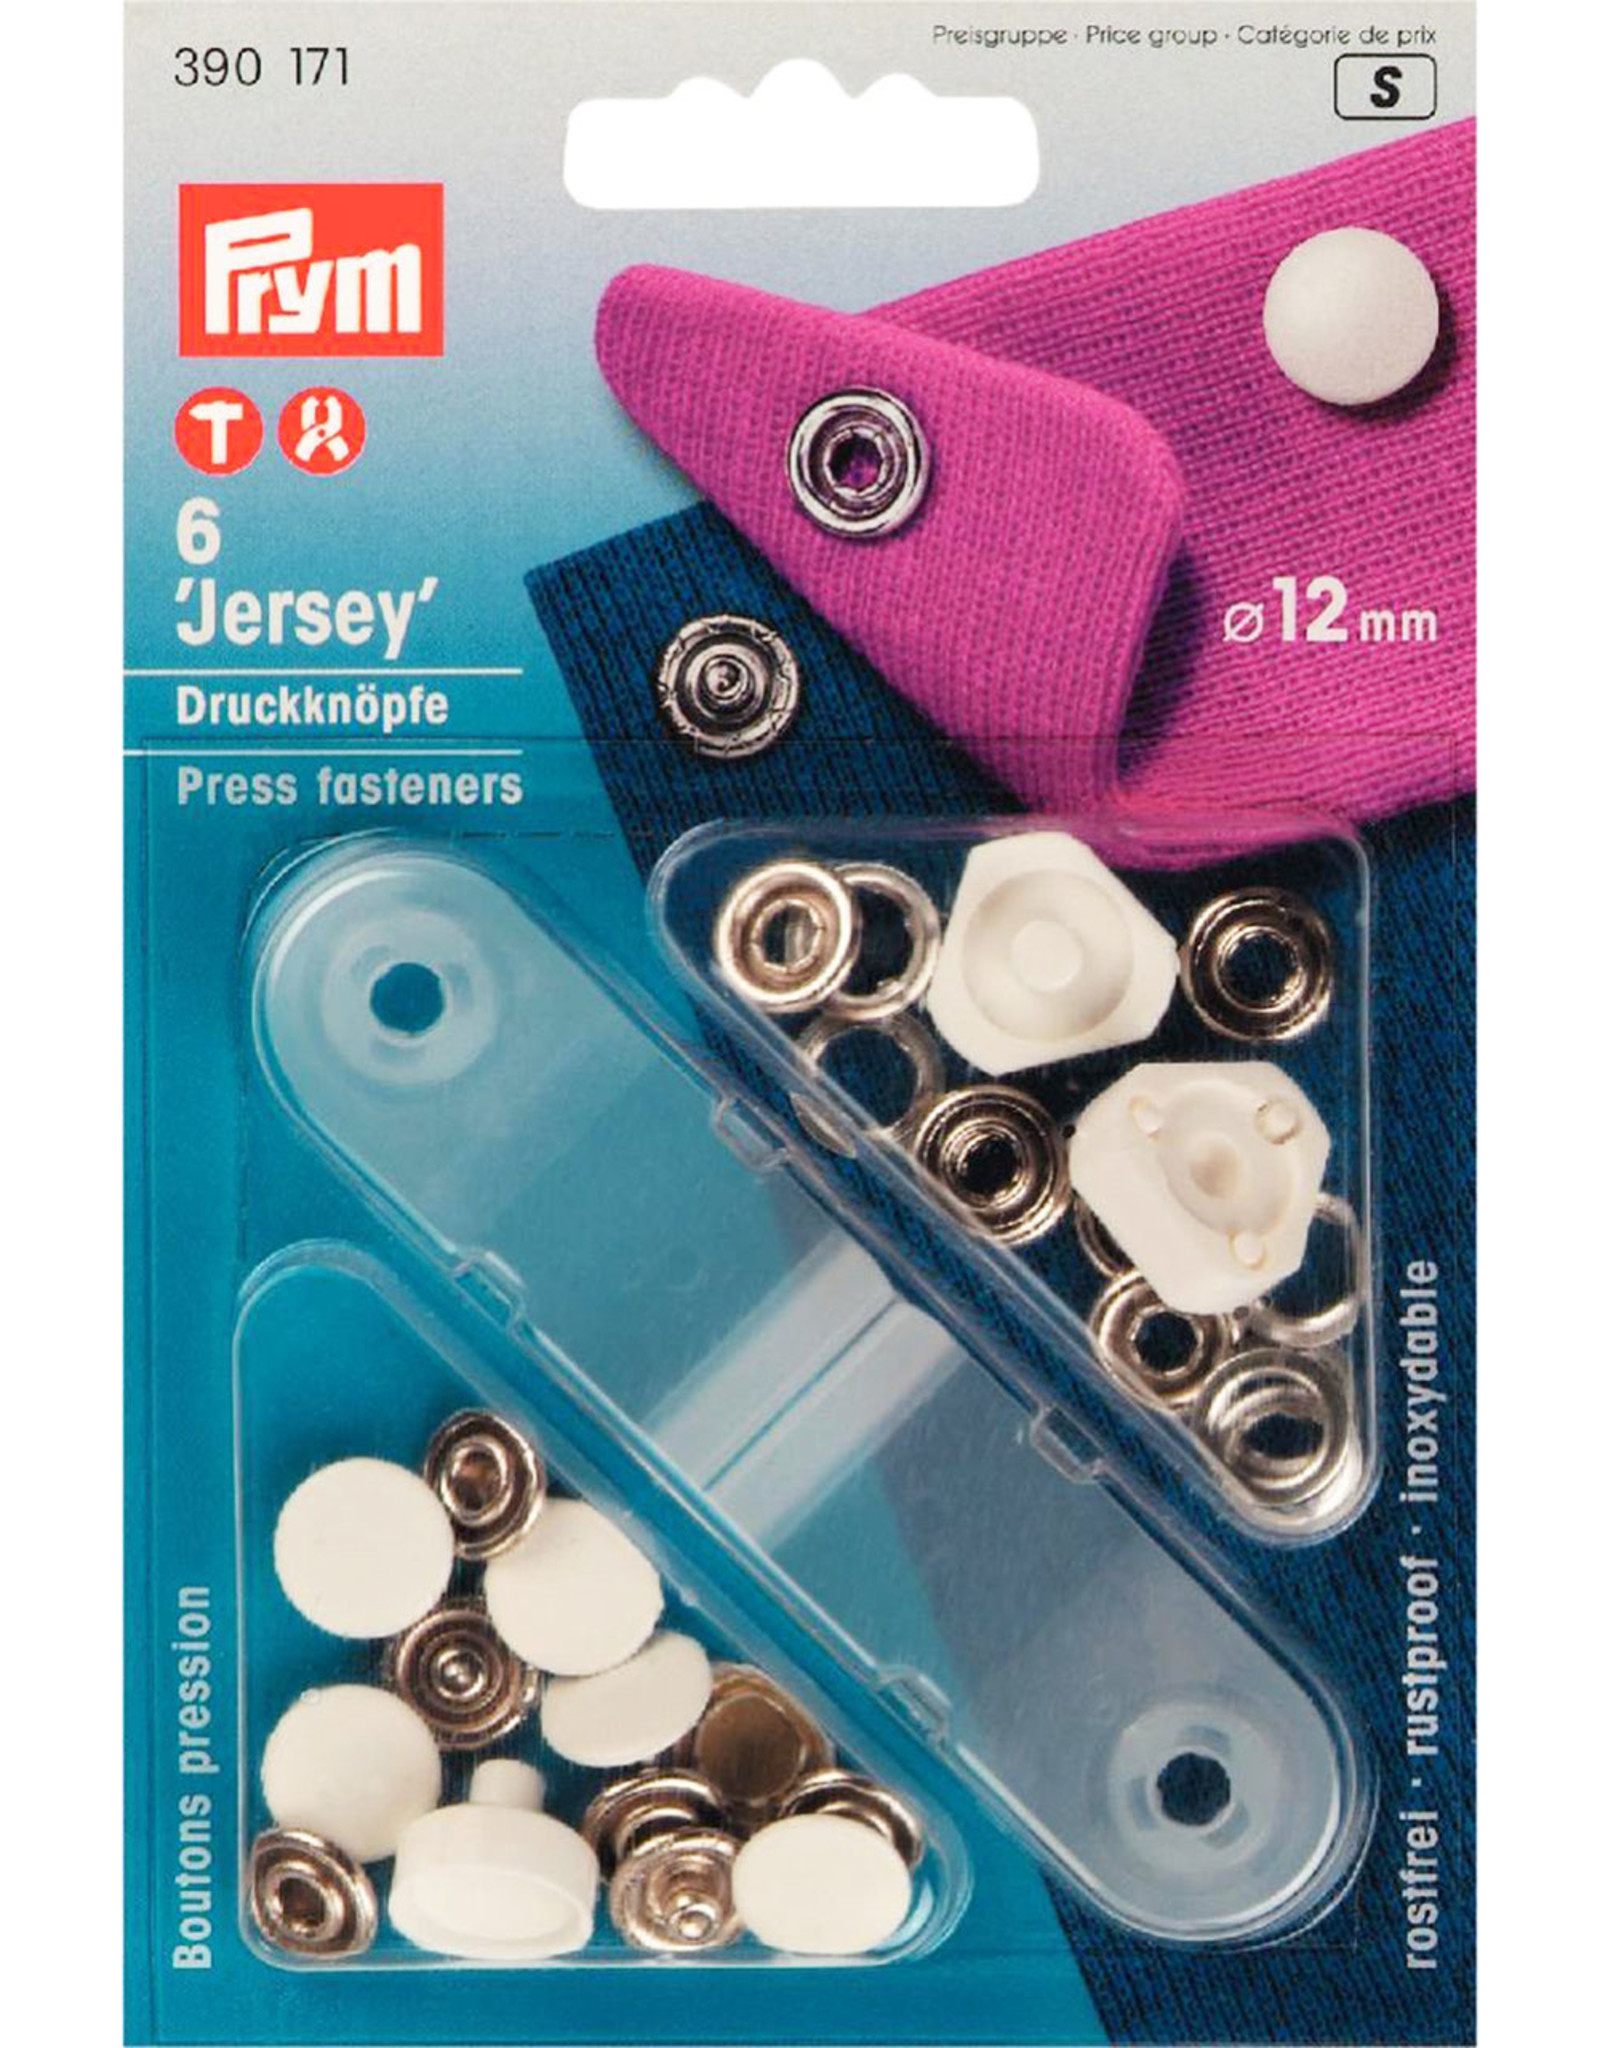 Prym Prym - Naaivrijedrukknopen Wit 12mm - 390 171